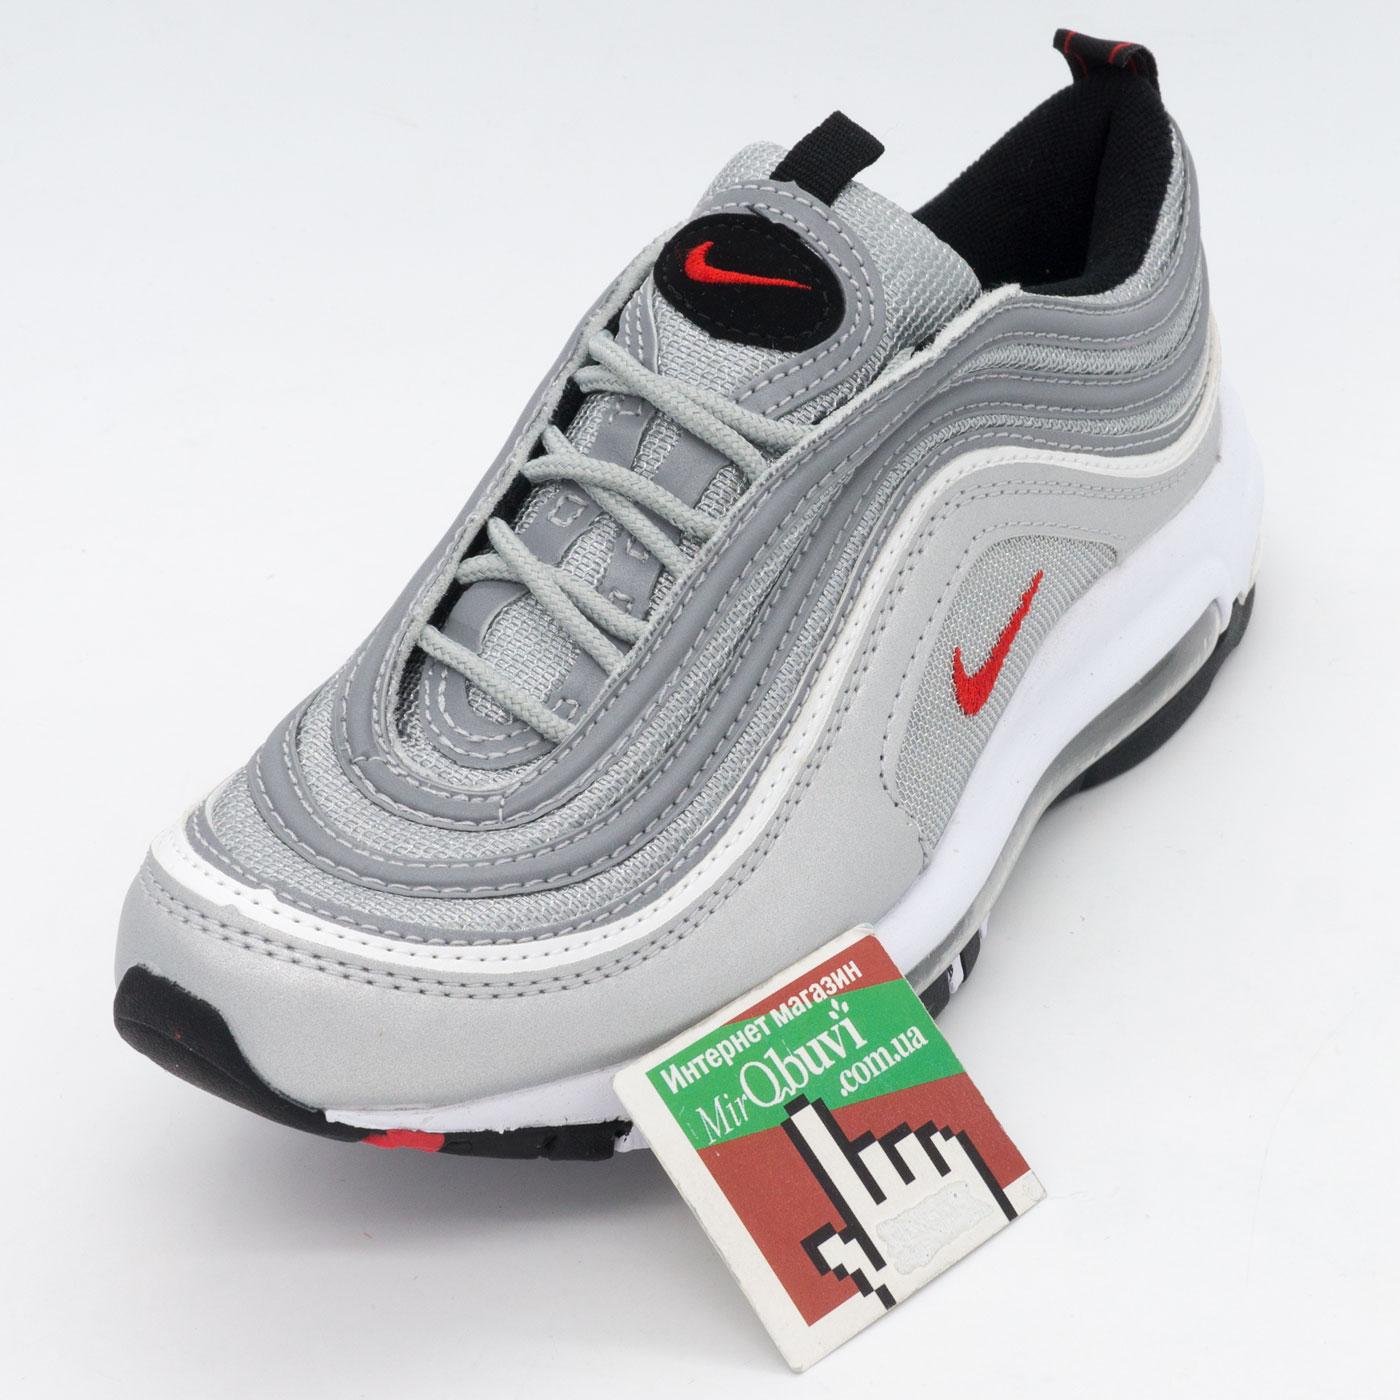 фото front Кроссовки Nike air max 97 серебристые. Топ качество! front